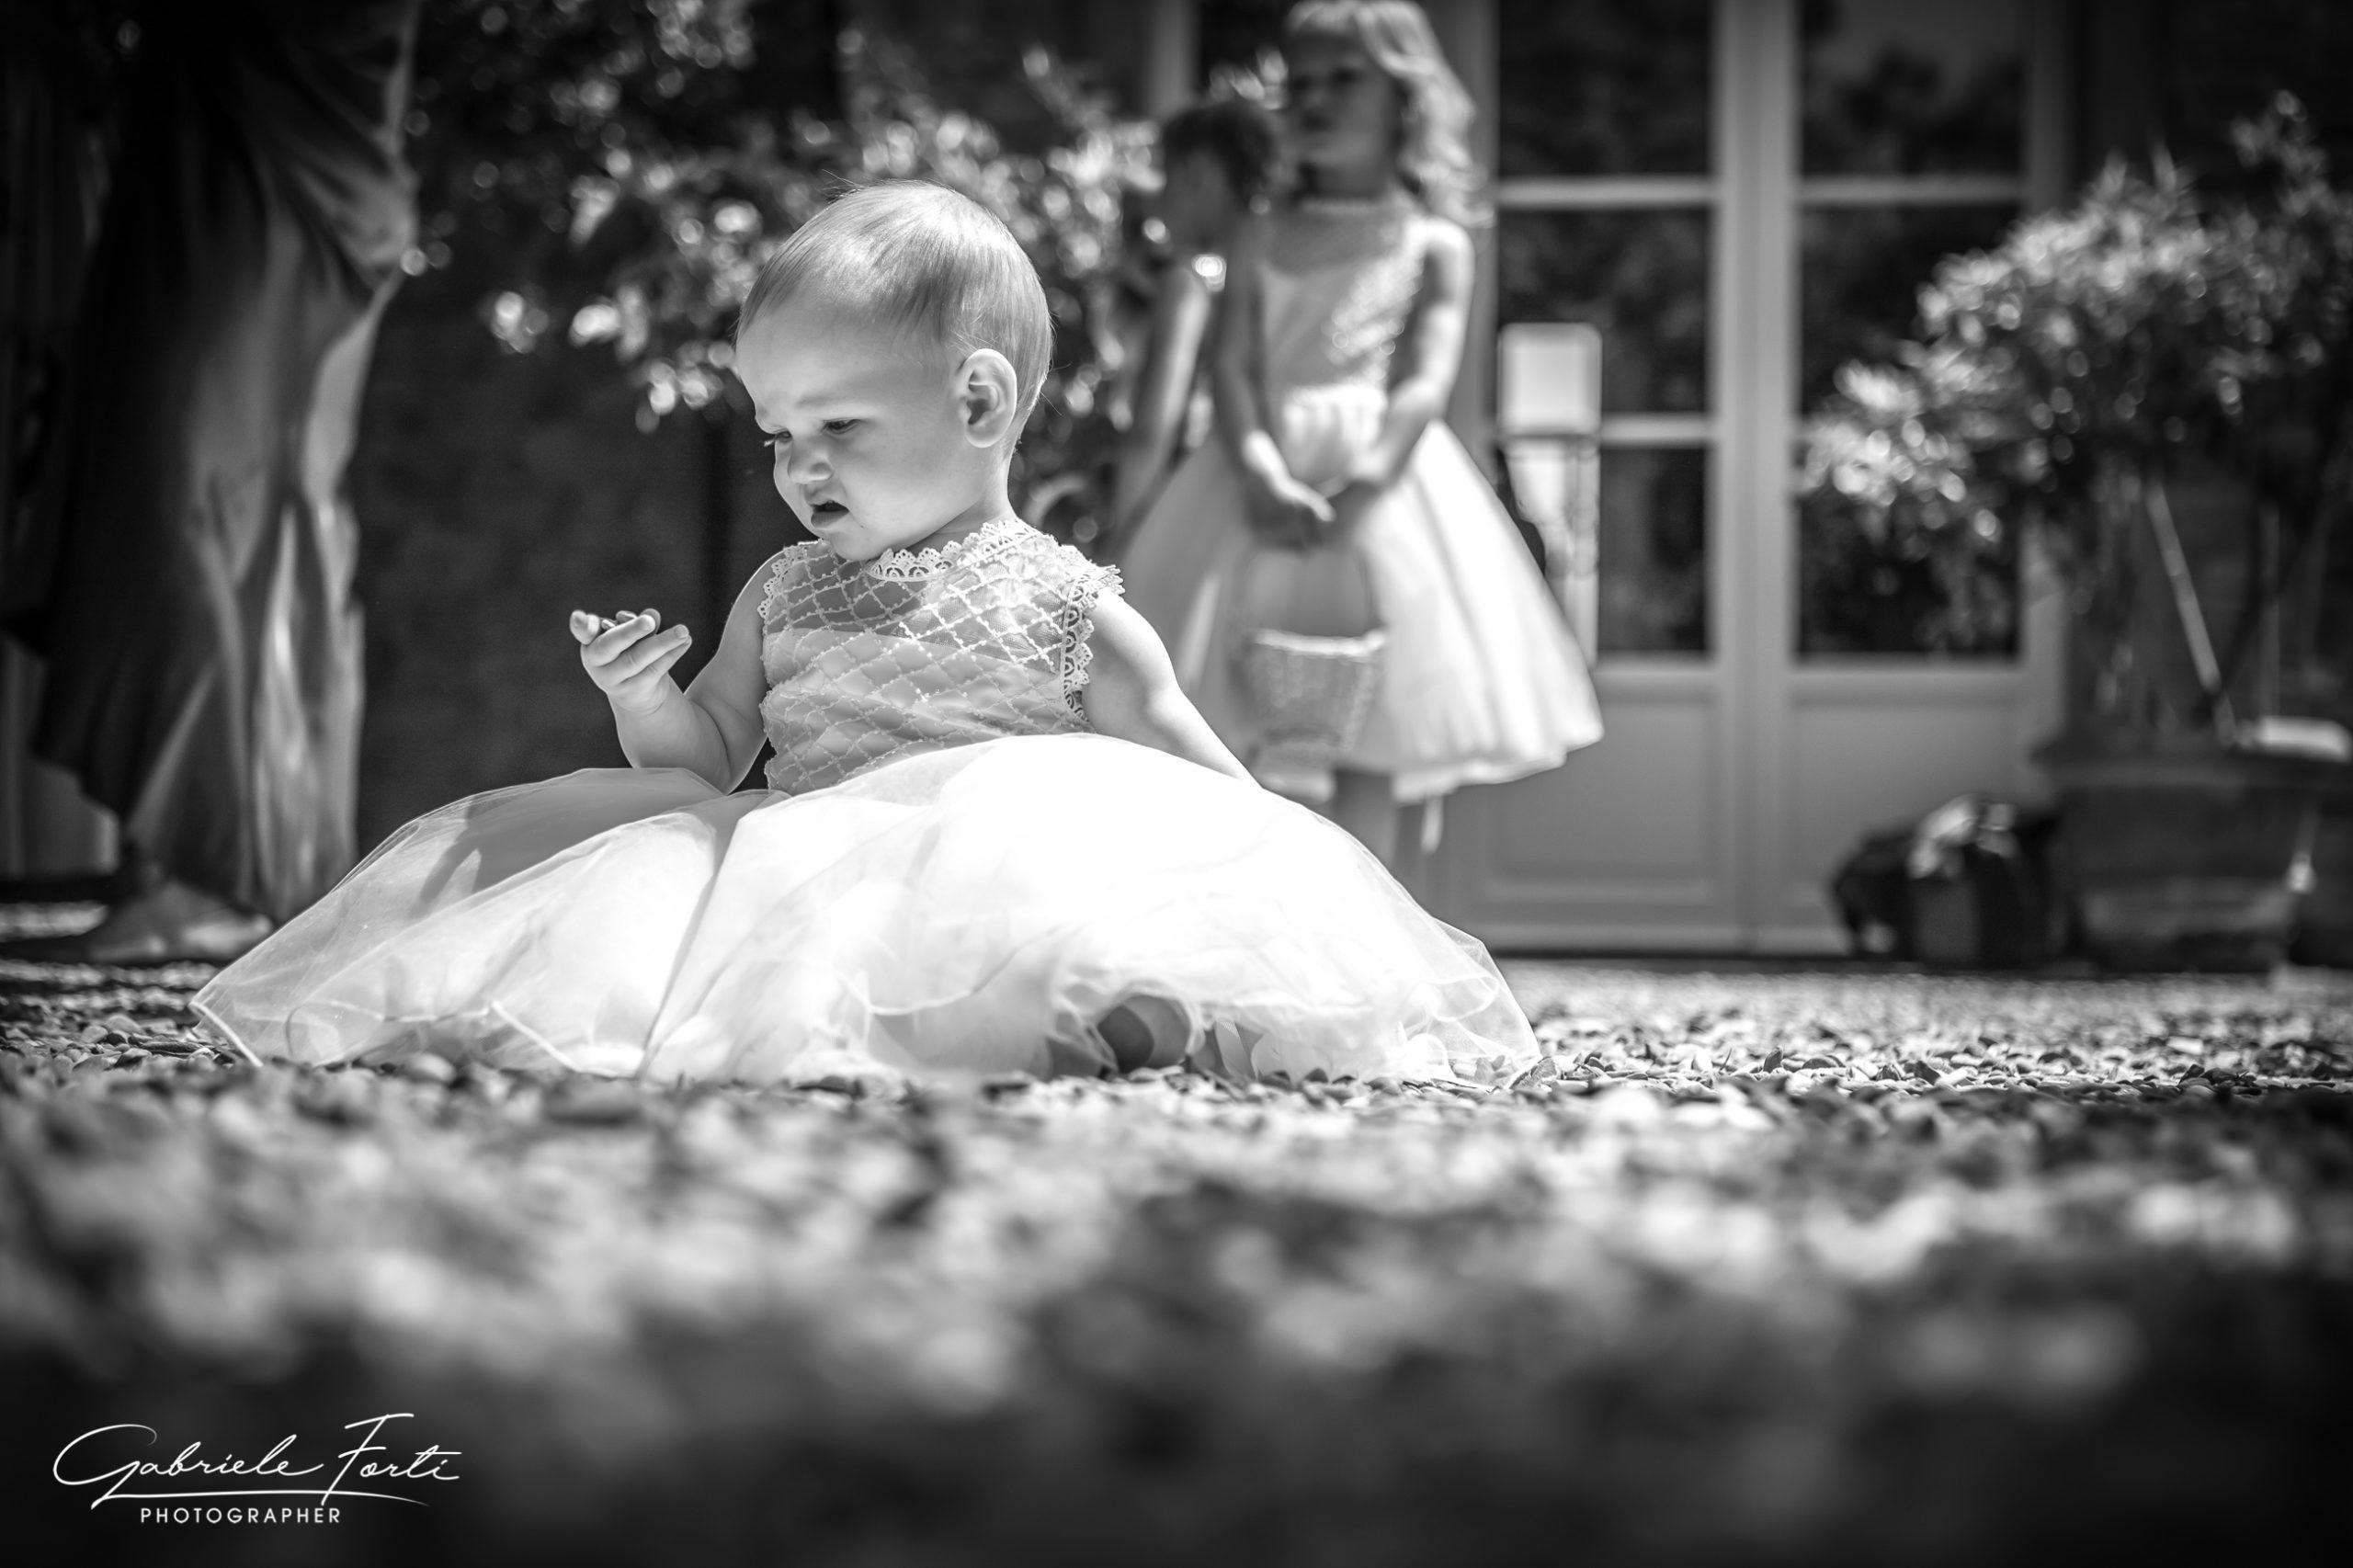 wedding-cortona-tuscany-italy-photographer-foto-forti-gabriele-4